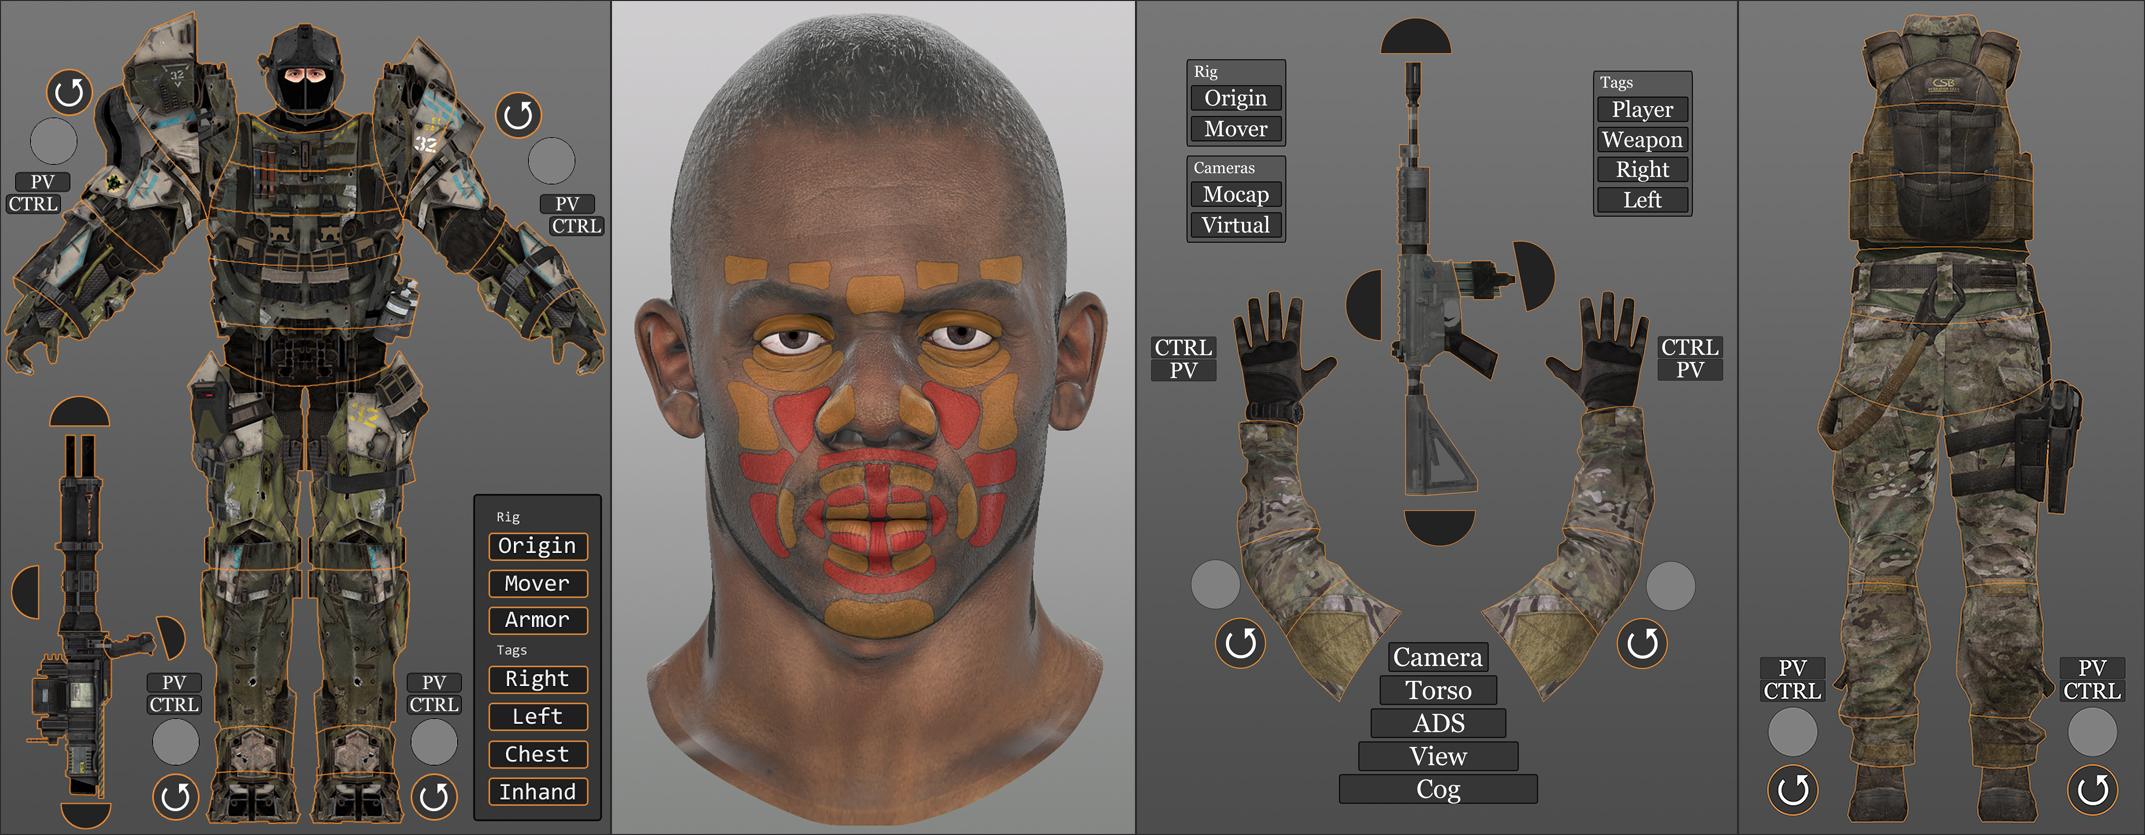 CharacterPickerExamples.jpg